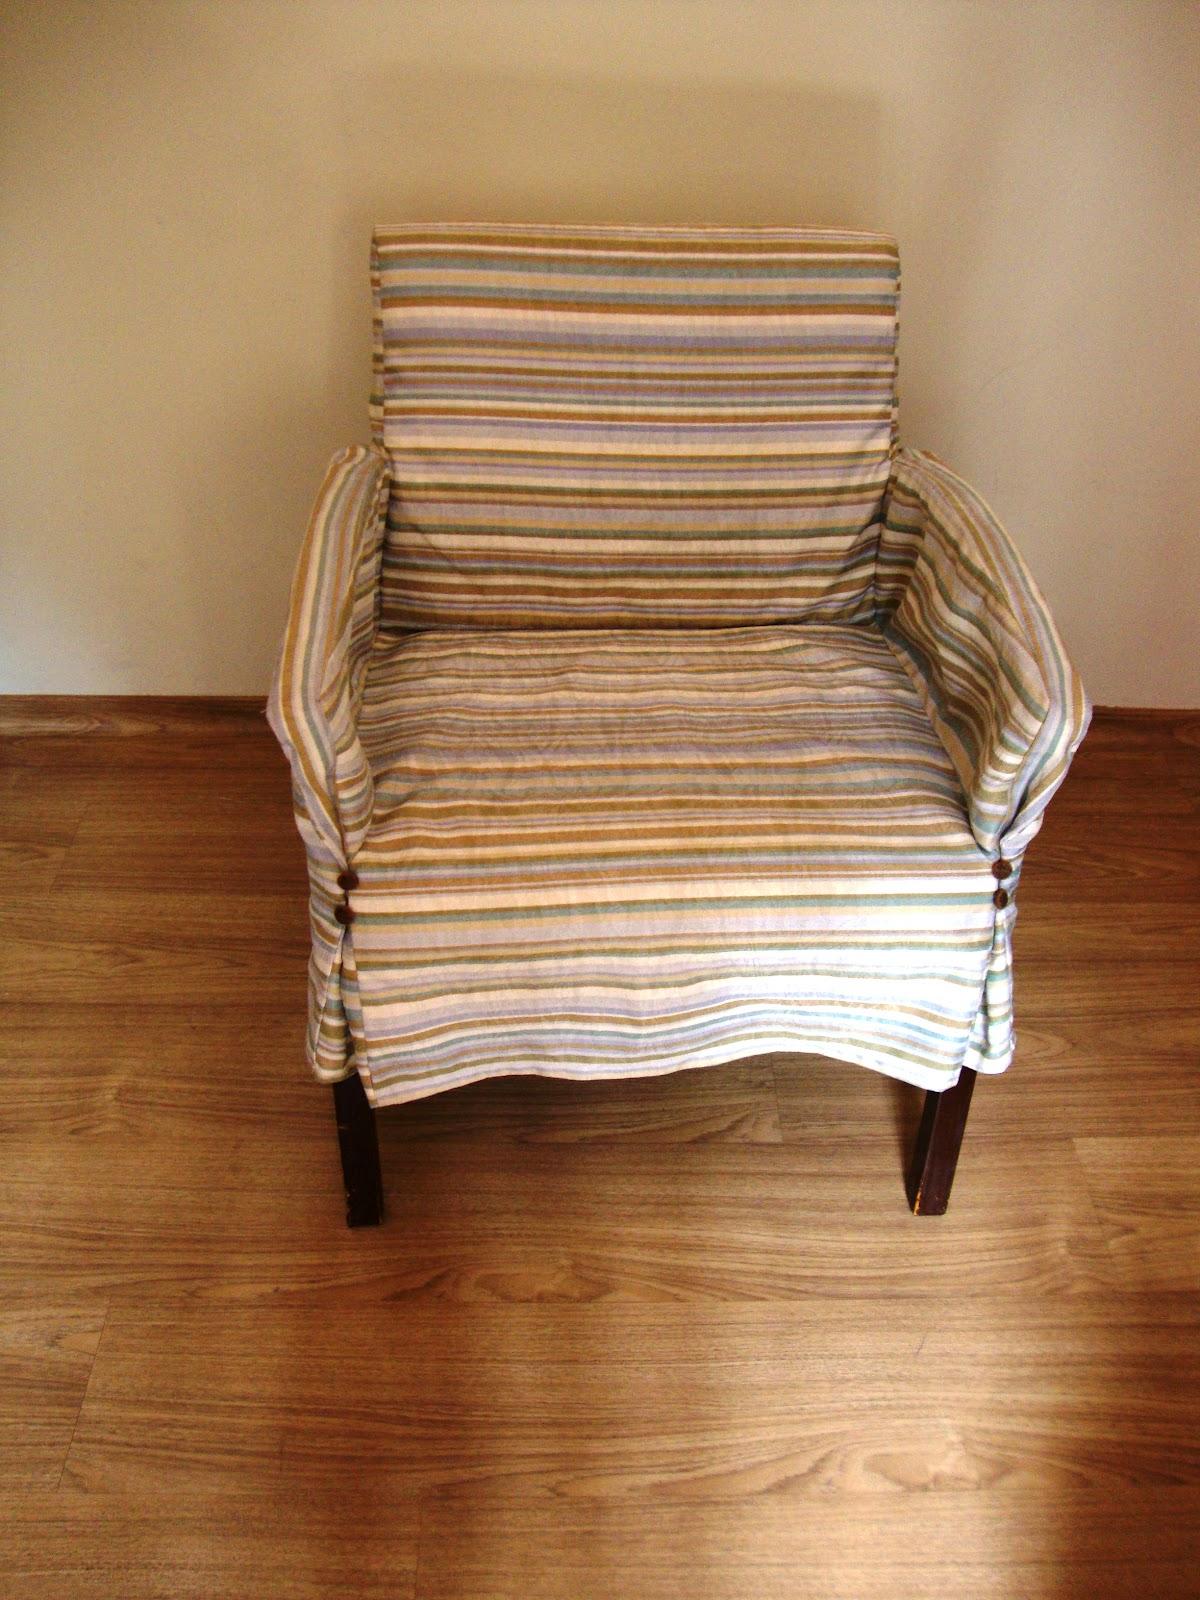 Babuchy Decor: Capa para Cadeira #743F1C 1200x1600